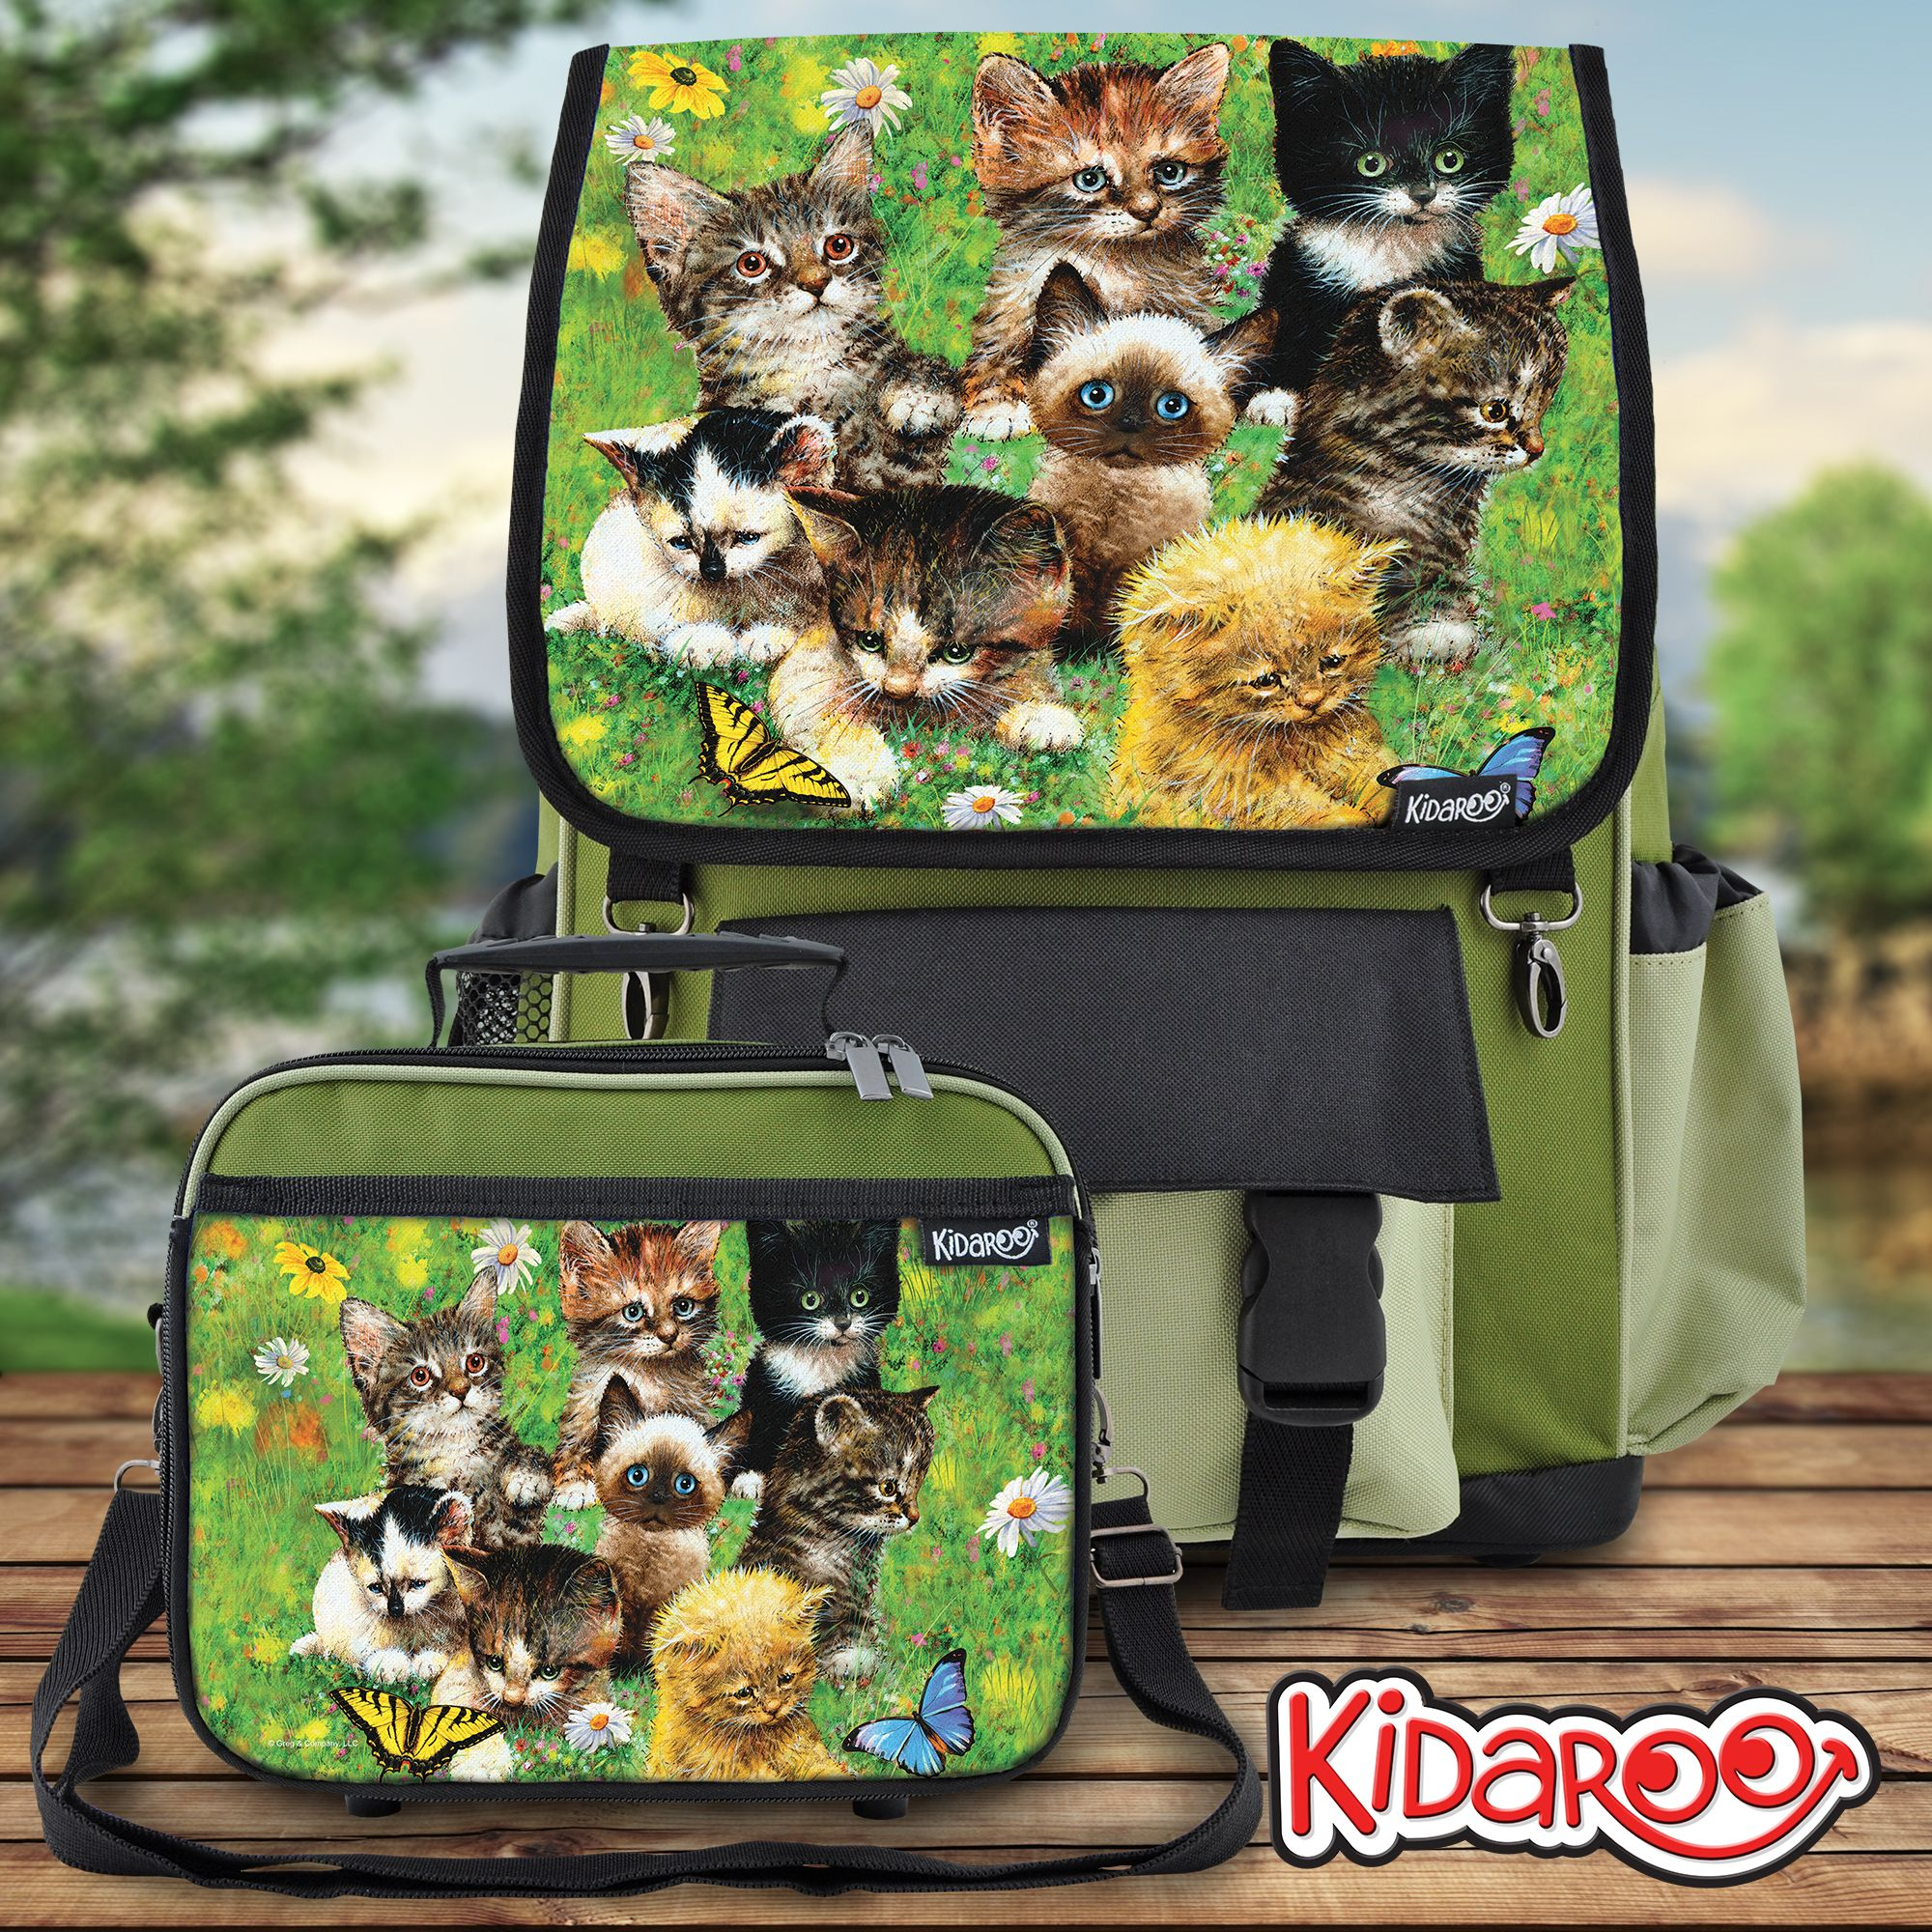 Kidaroo Cute Little Kittens High Quality Khaki Backpack   Lunchbox For  Girls 8b839076e86da